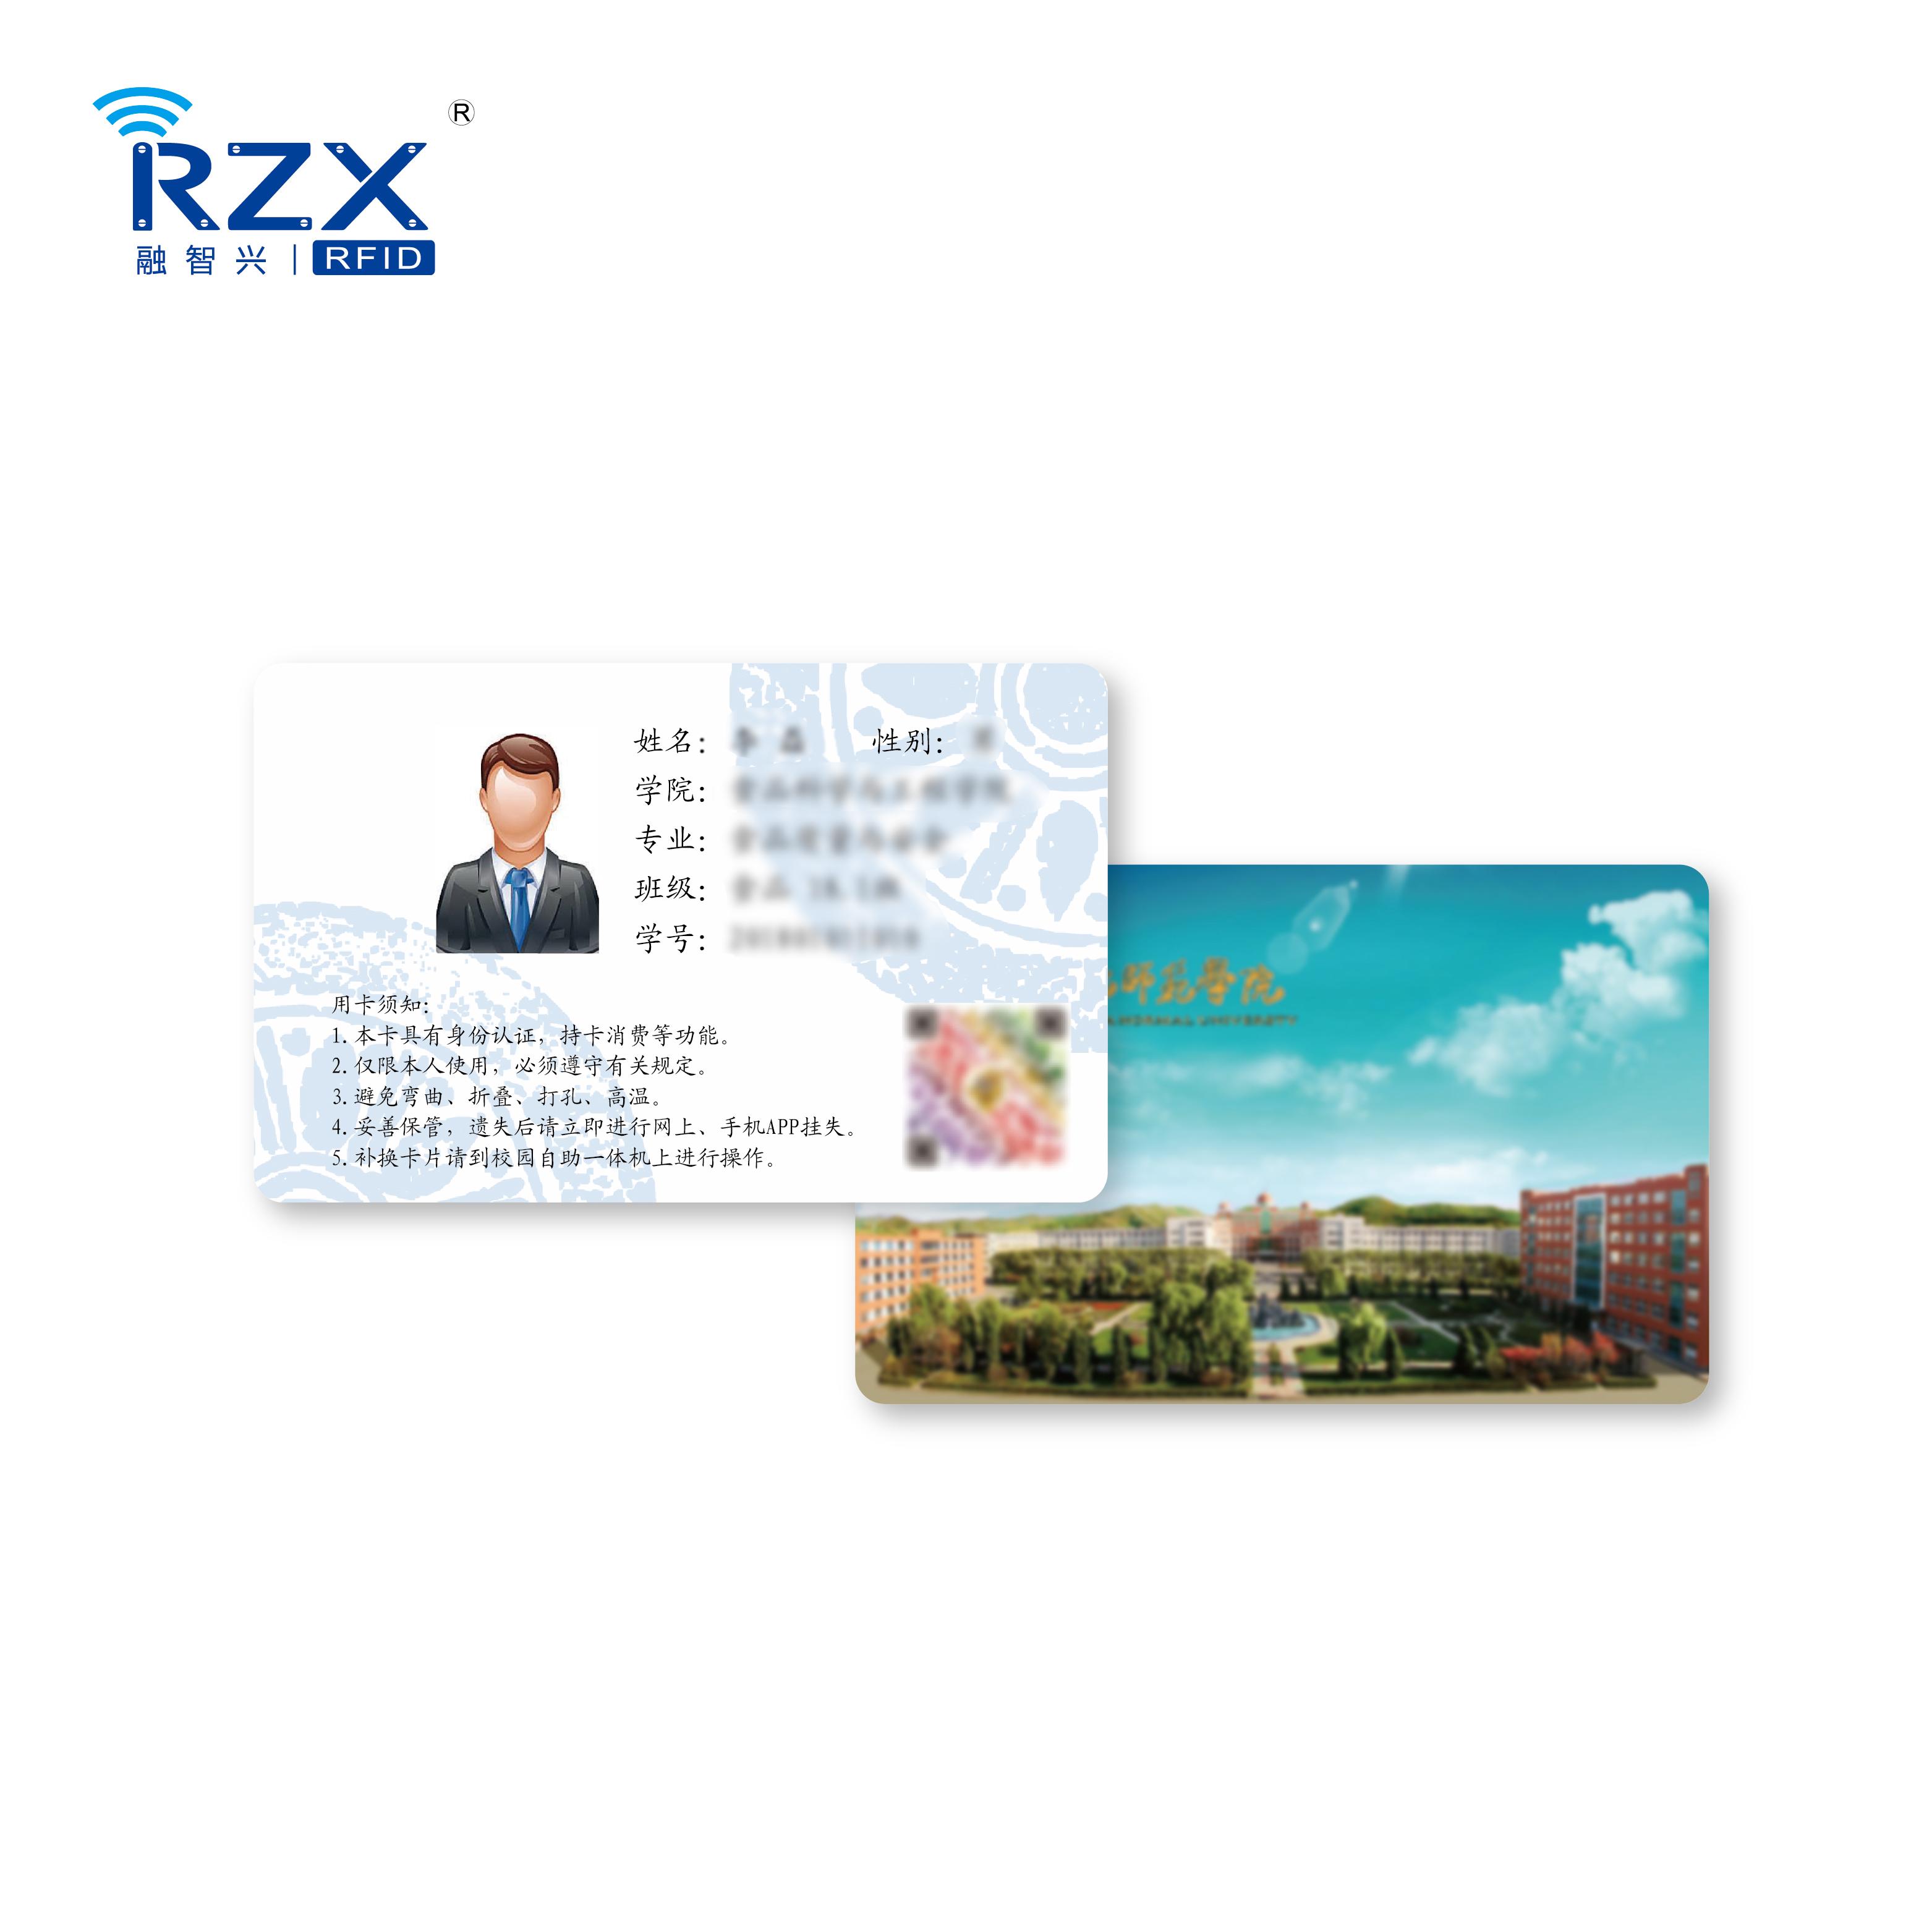 IC人像证件卡